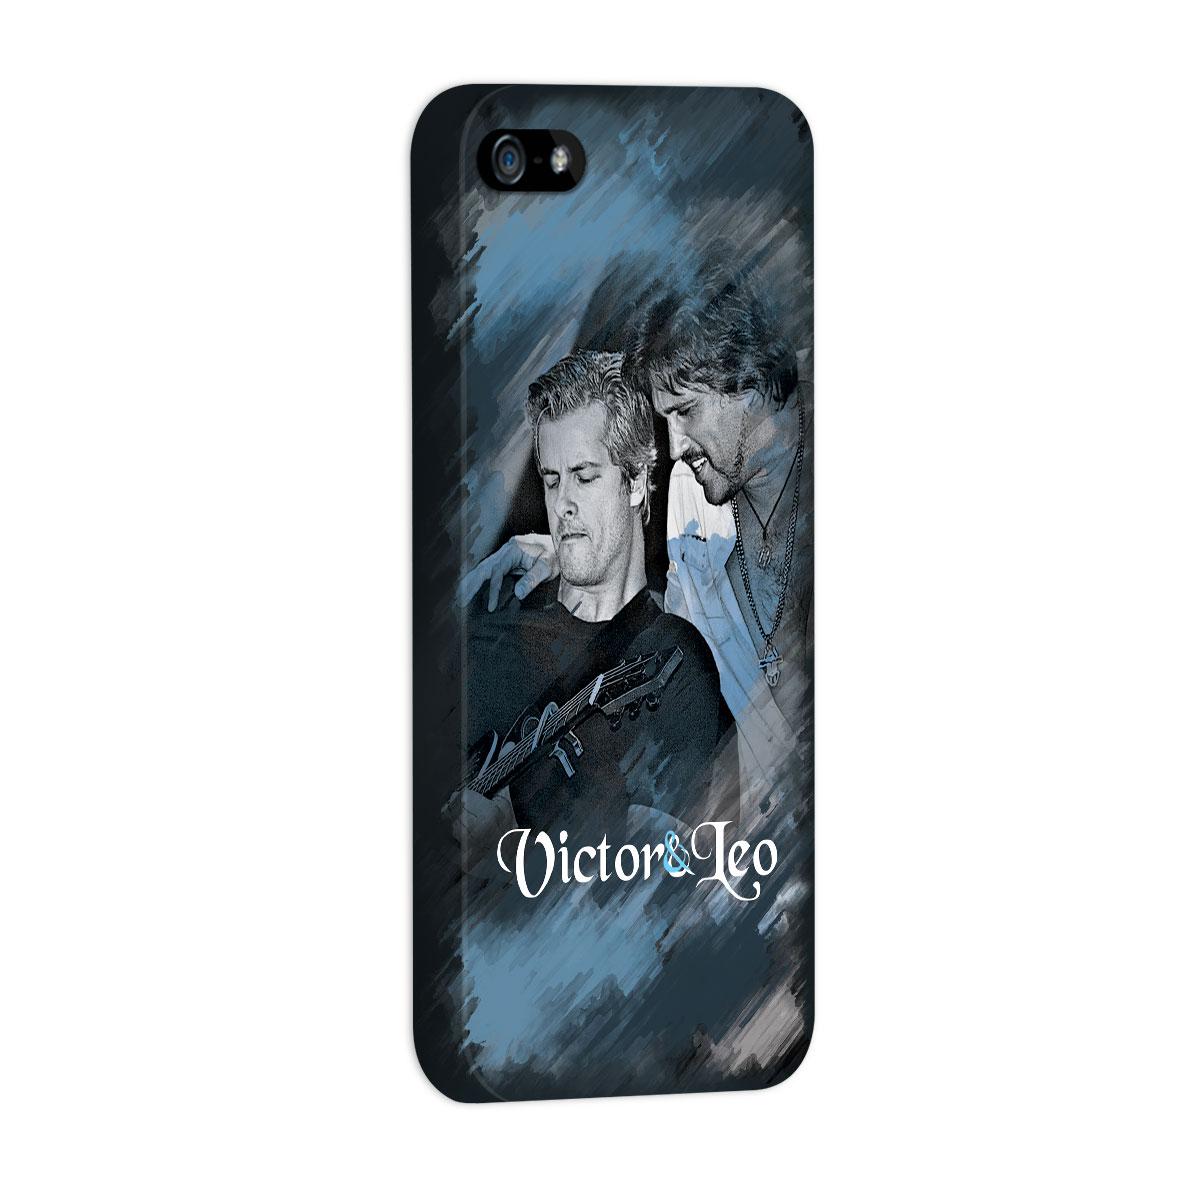 Capa para iPhone 5/5S Victor & Leo Perfil